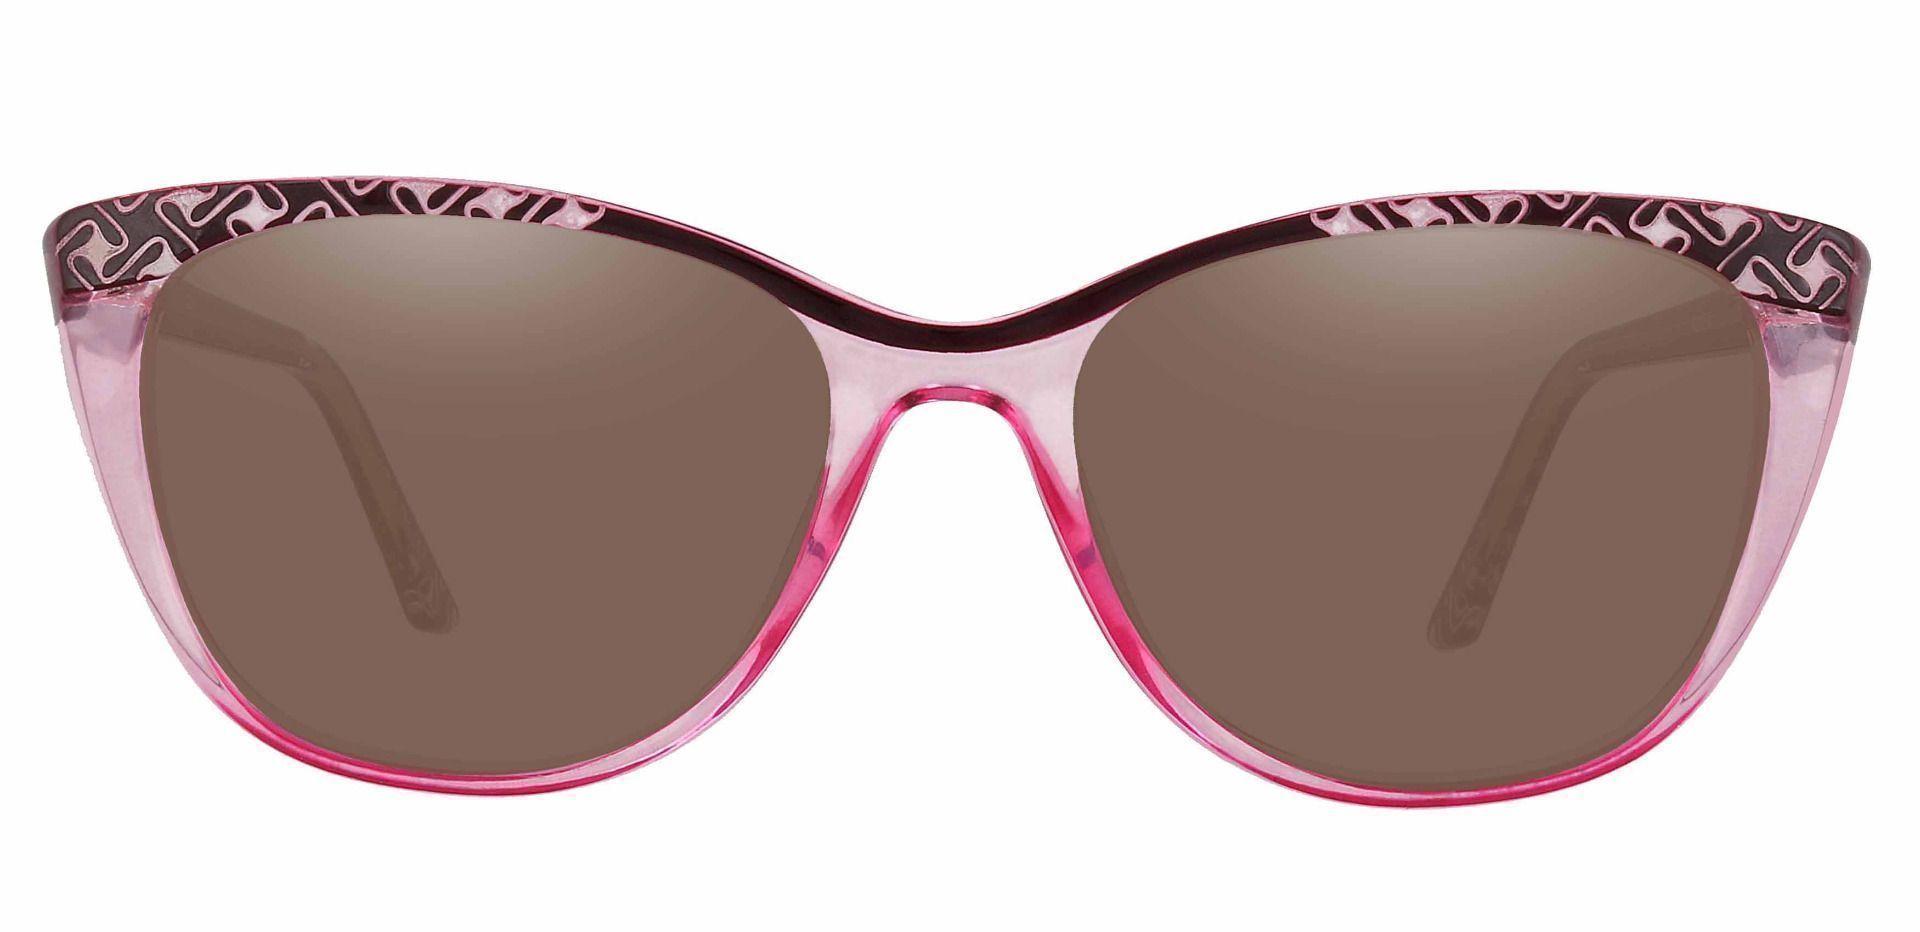 Alberta Cat Eye Reading Sunglasses - Pink Frame With Brown Lenses